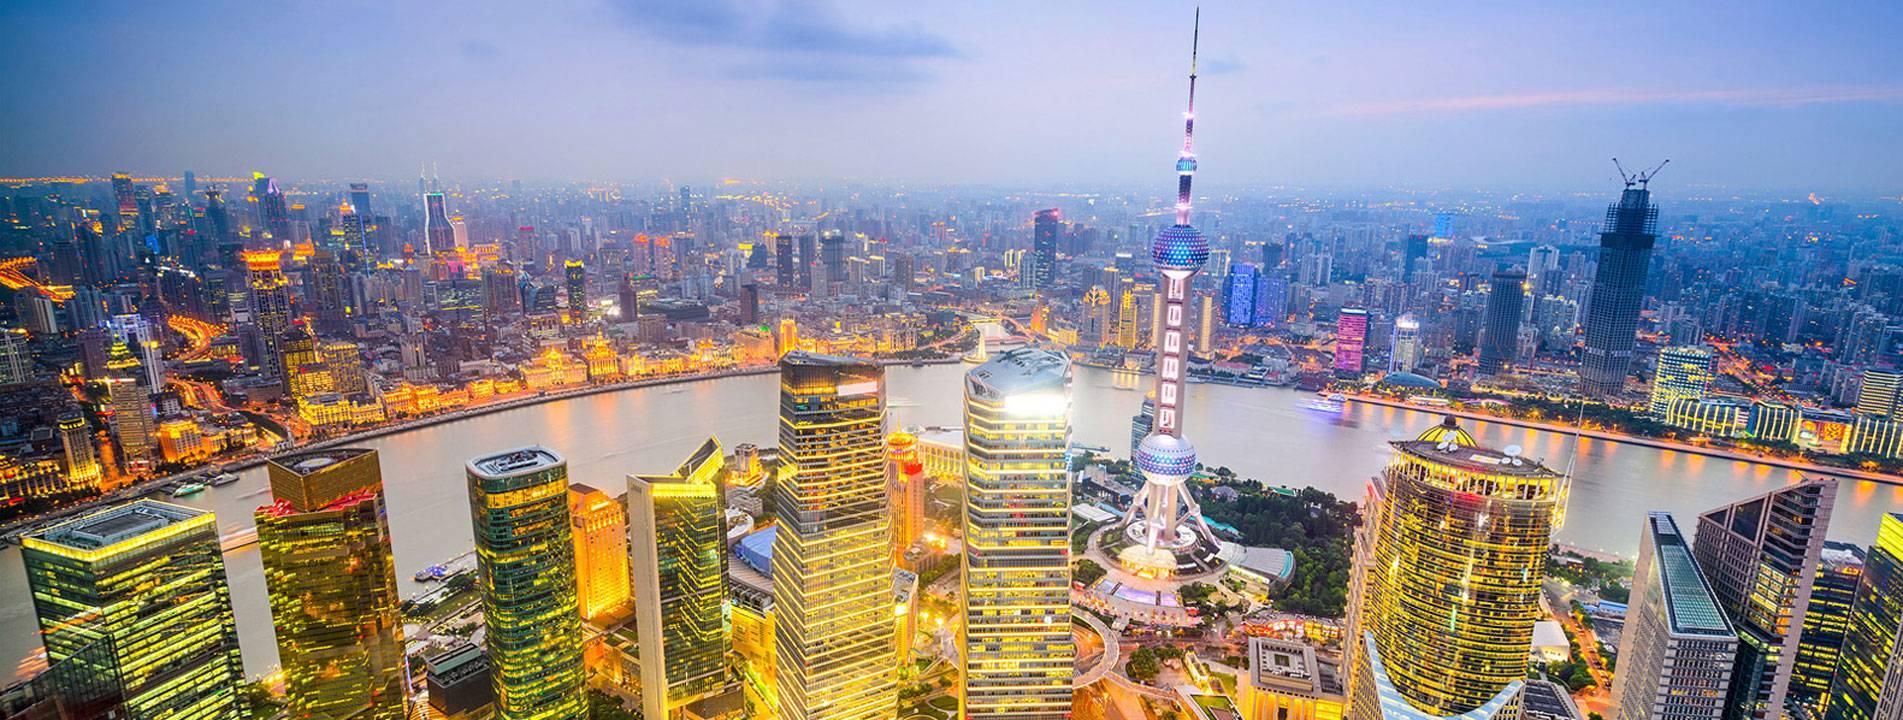 The skyscrapers in Shanghai